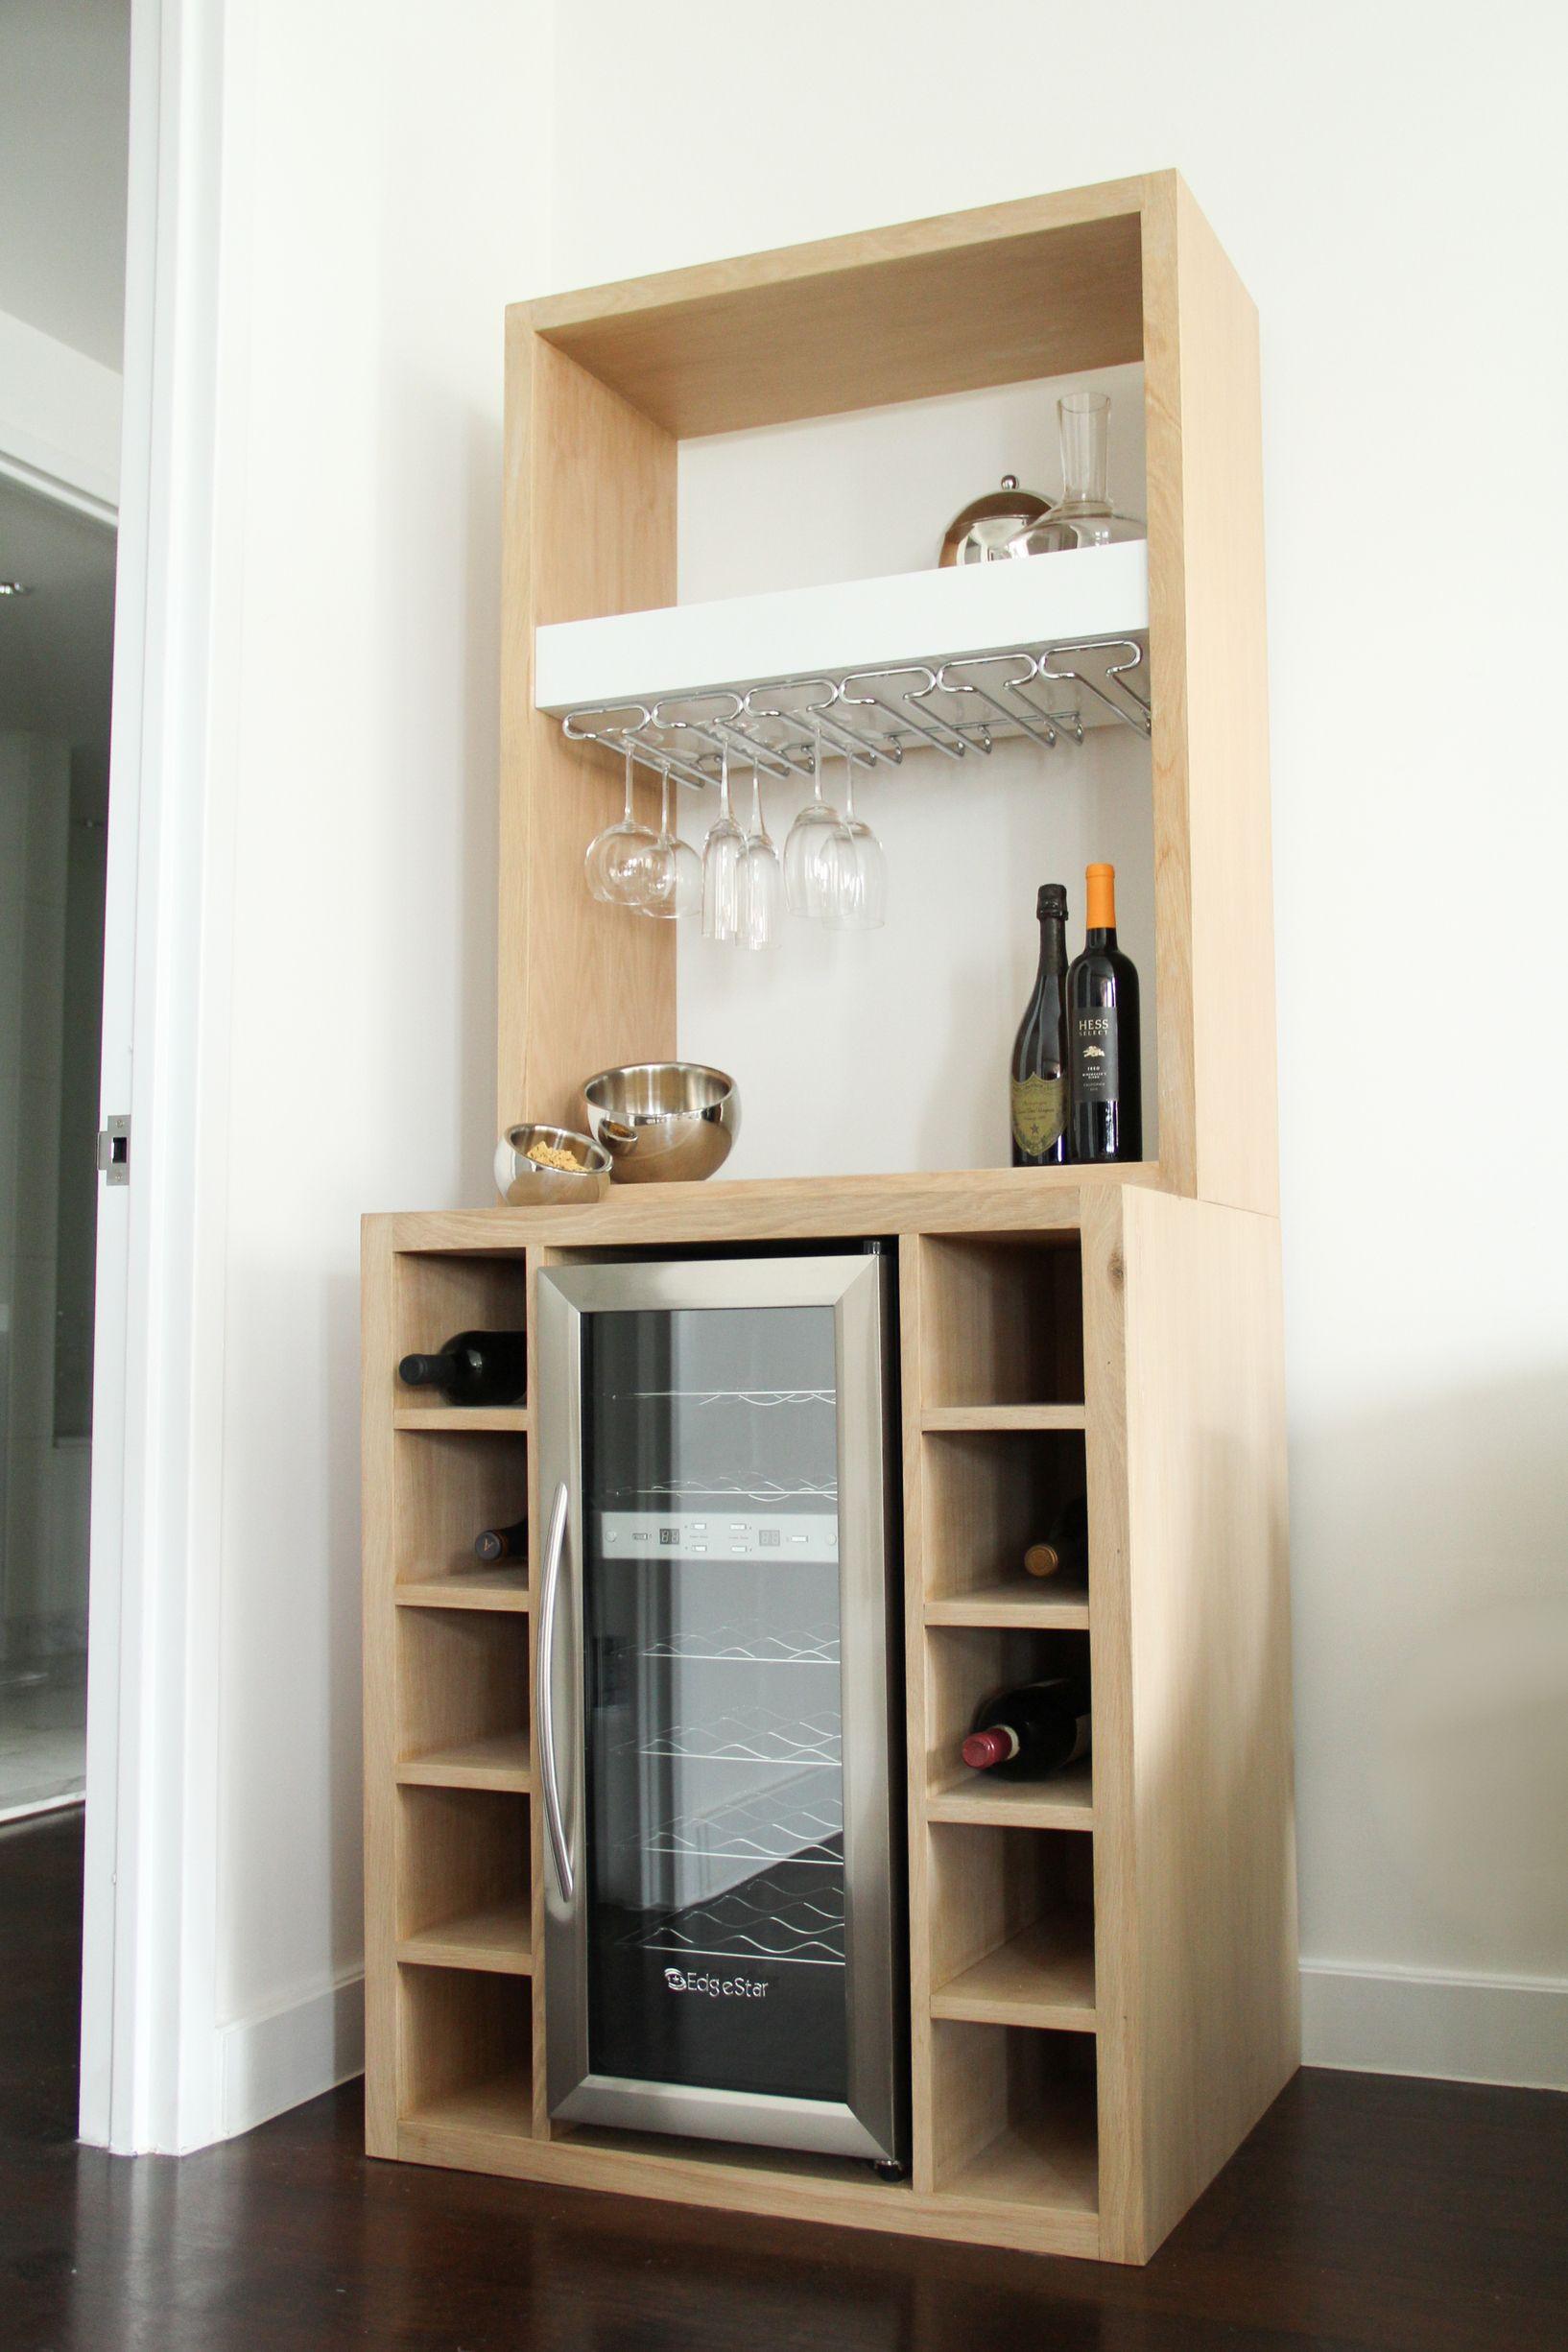 Pin by Dorothy Macik on Built in wine